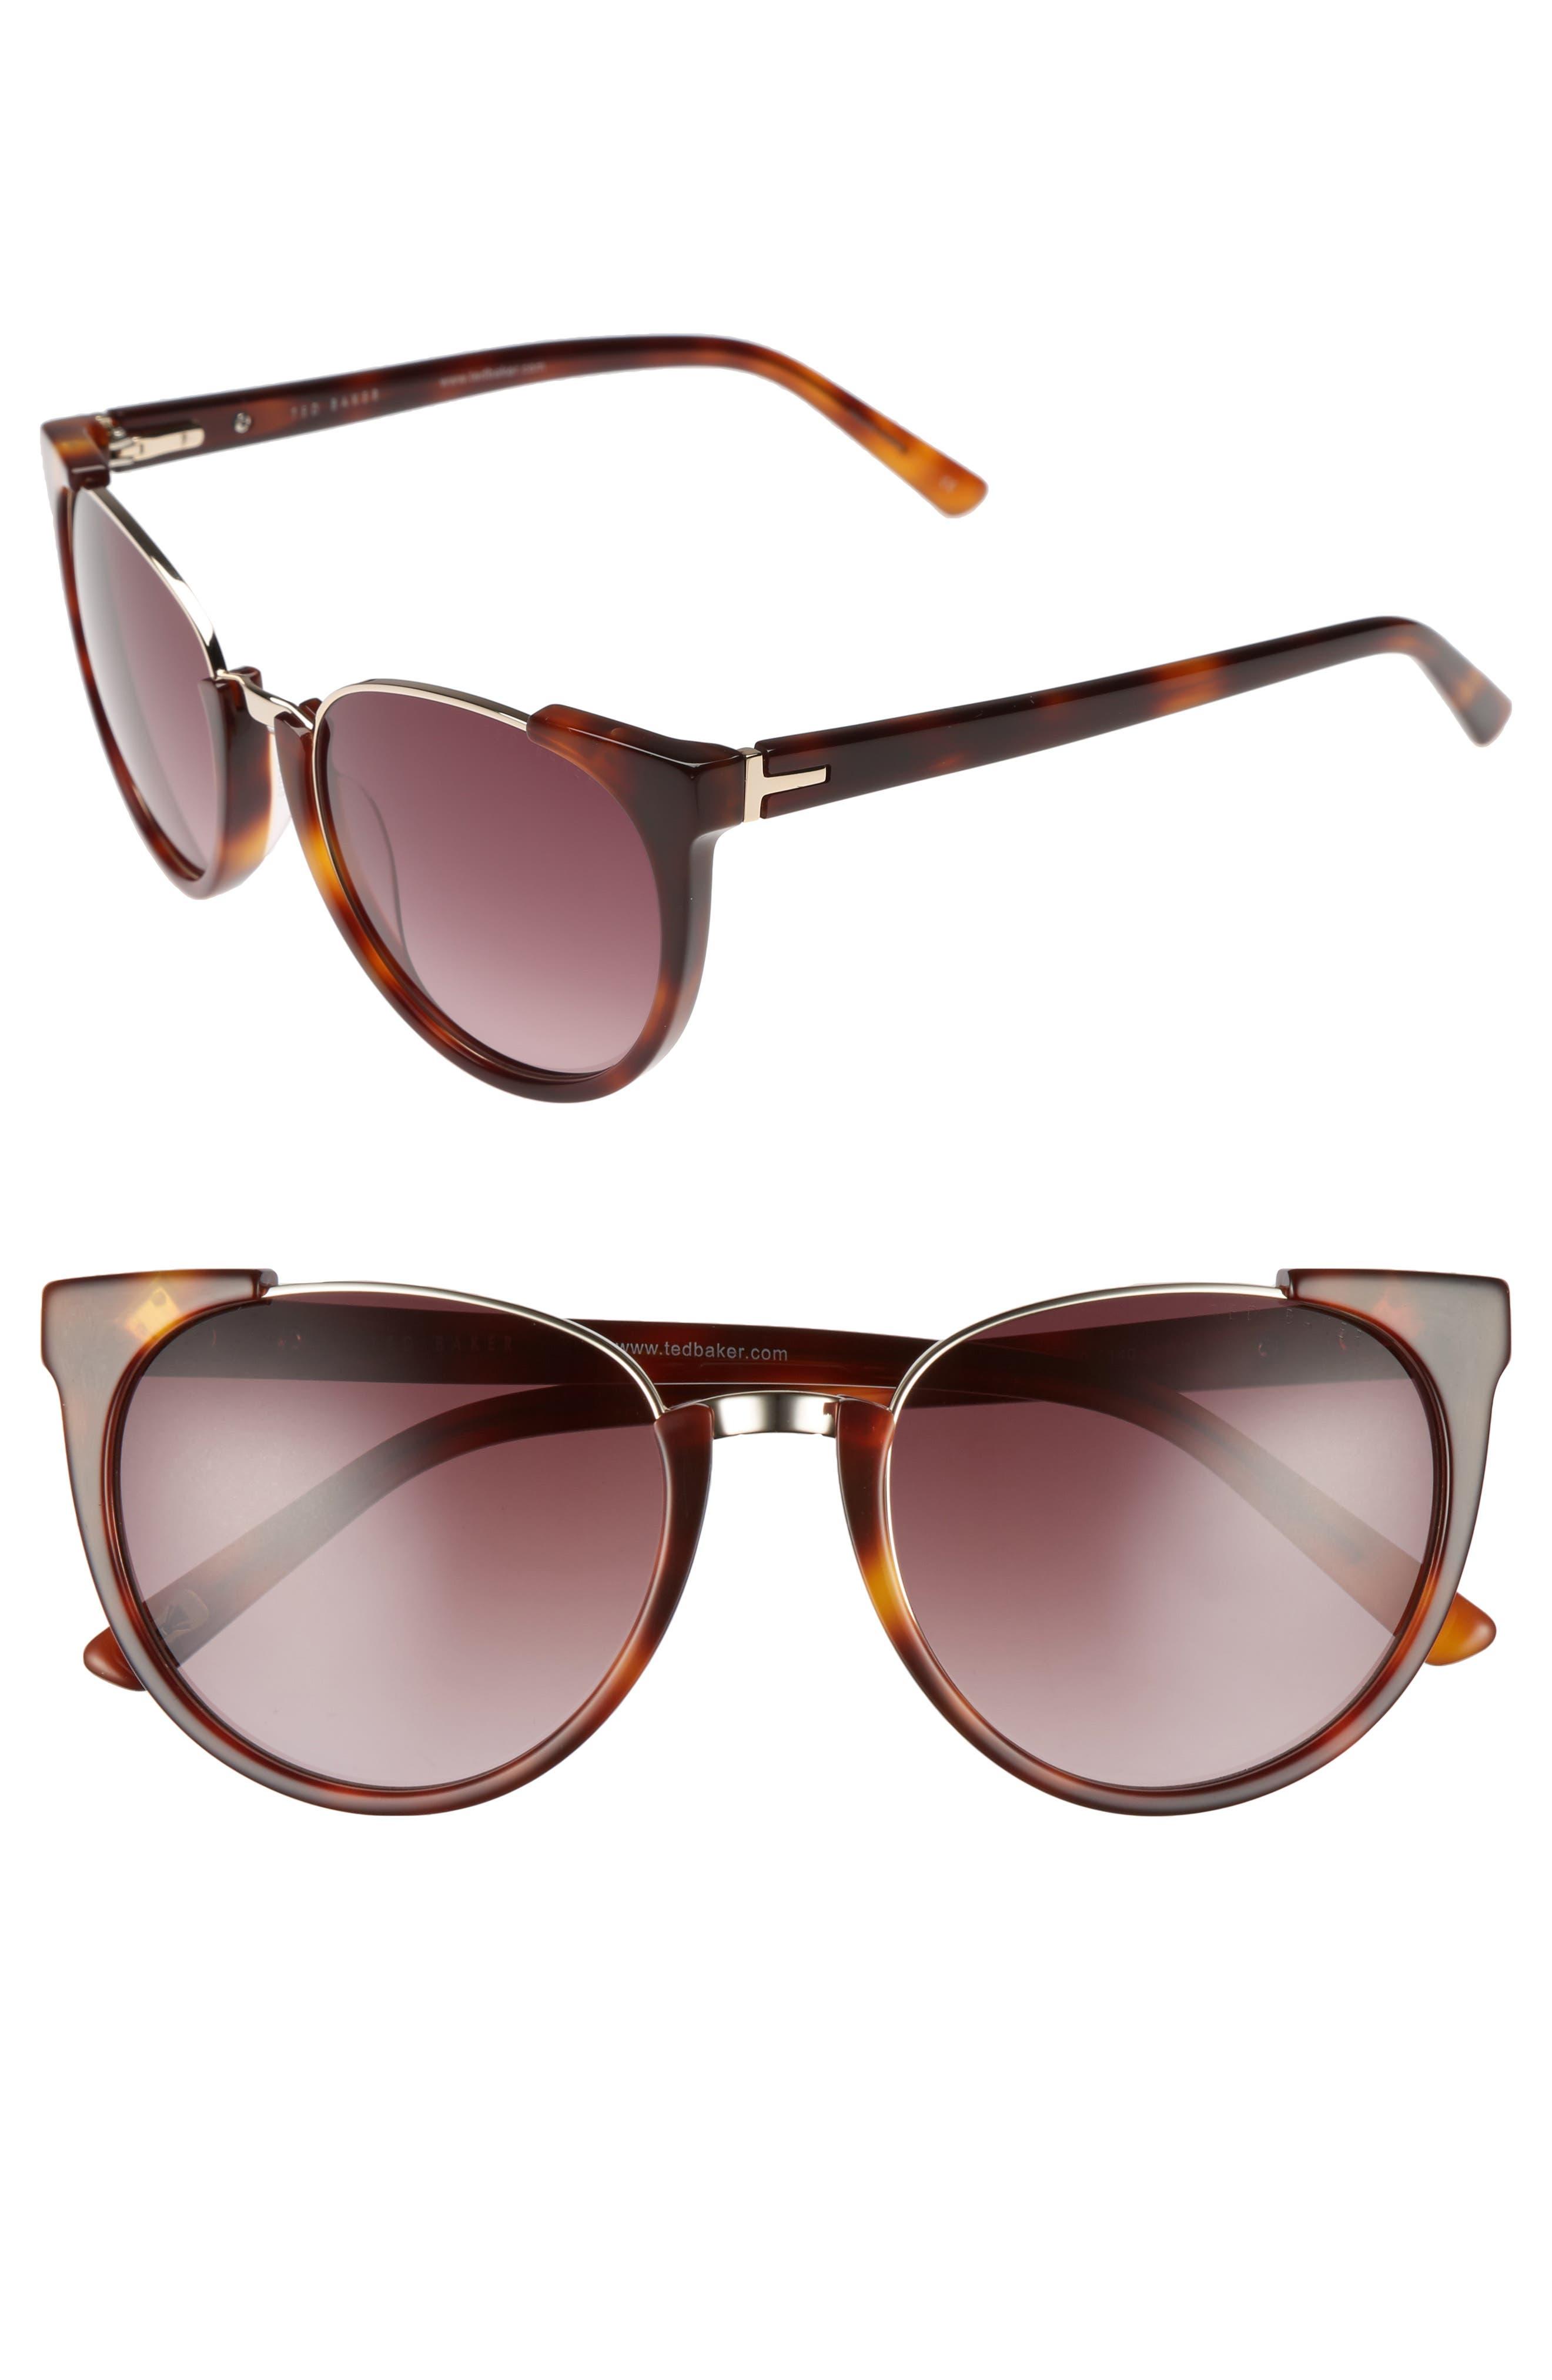 53mm Modified Oval Sunglasses,                             Main thumbnail 1, color,                             TORTOISE